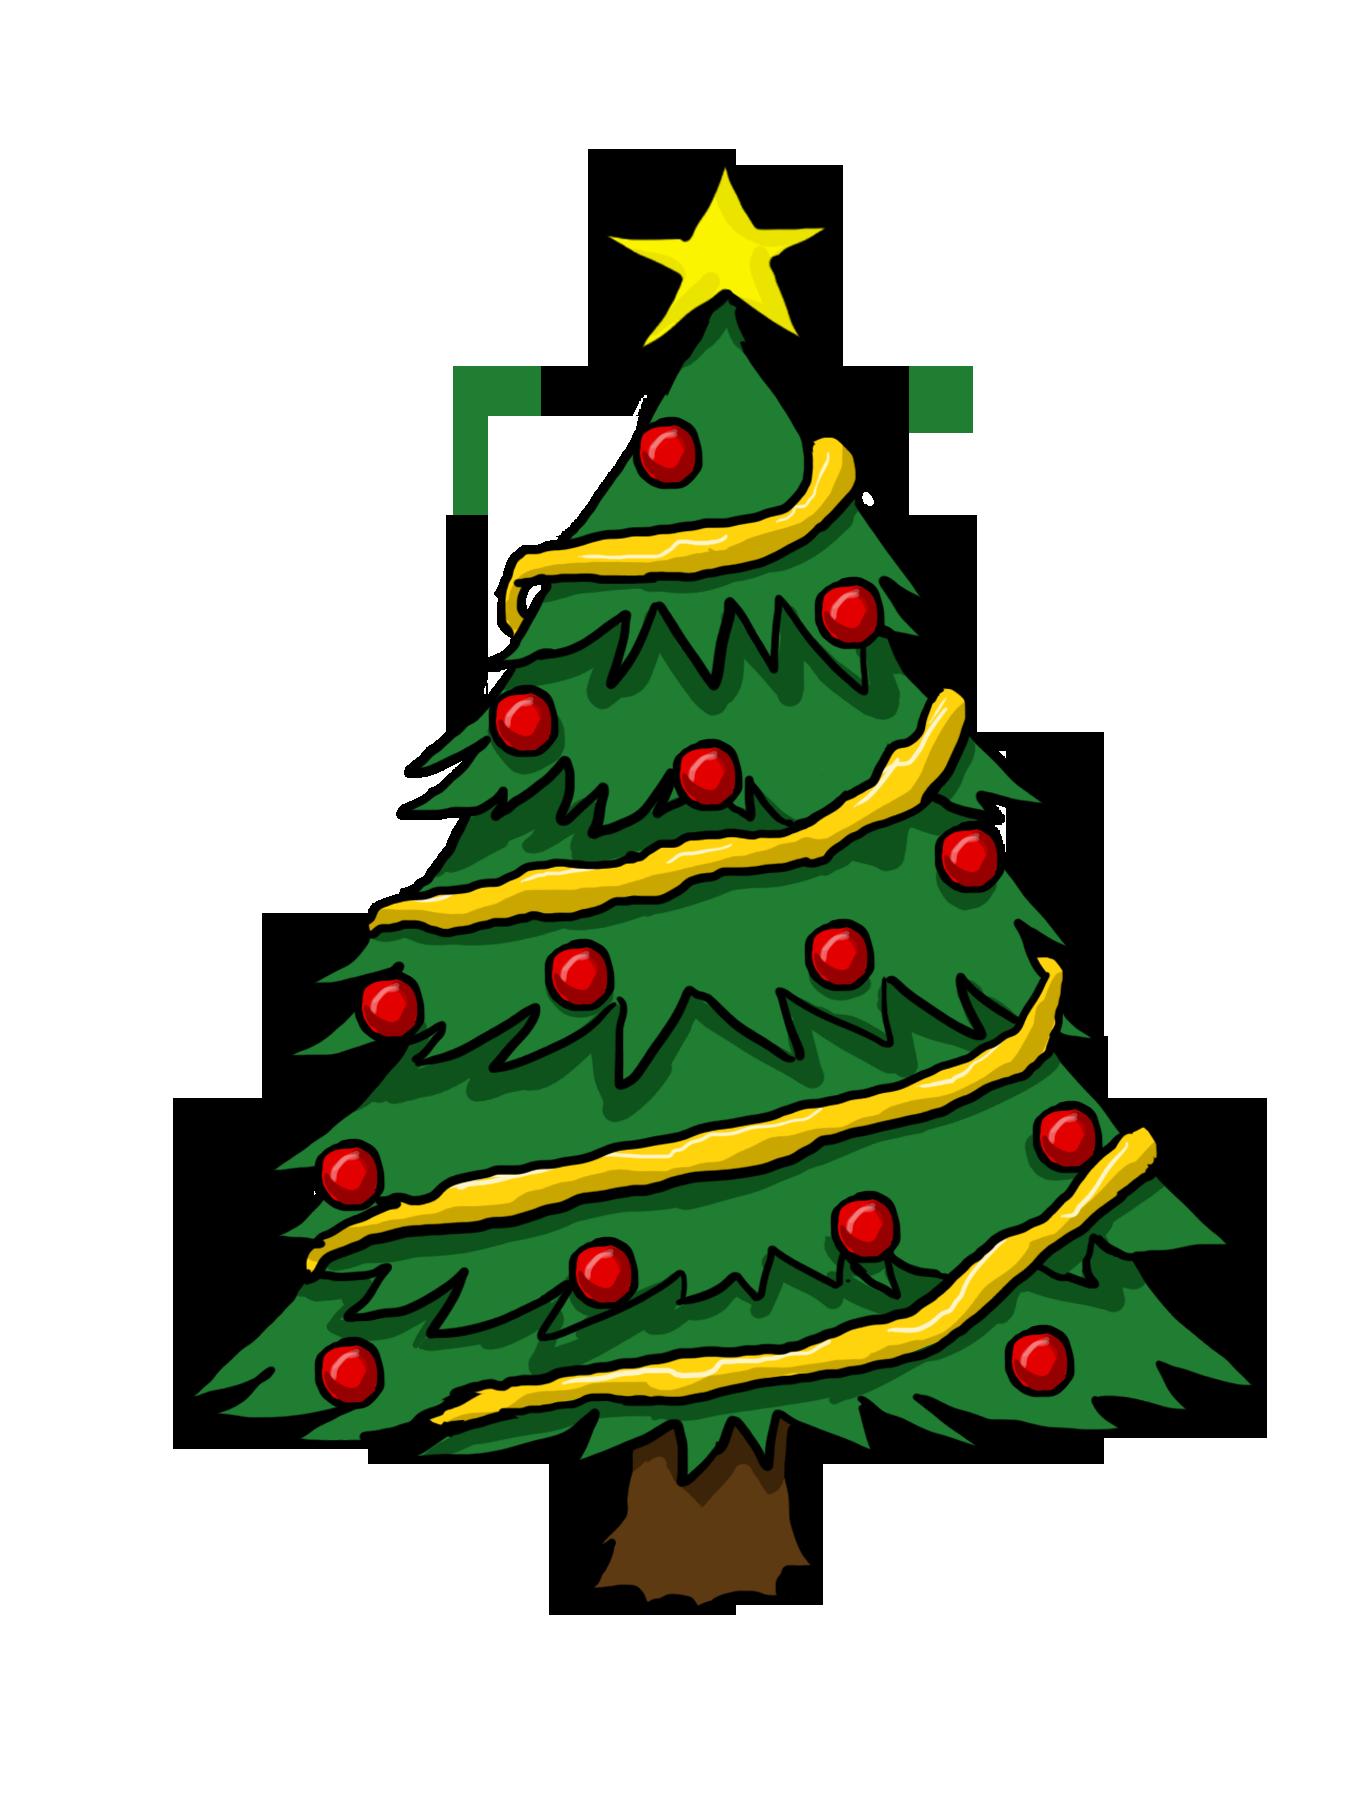 Christmas Tree Clipart Free : christmas, clipart, Cliparts, Christmas, Drawing,, Clipart,, Drawing